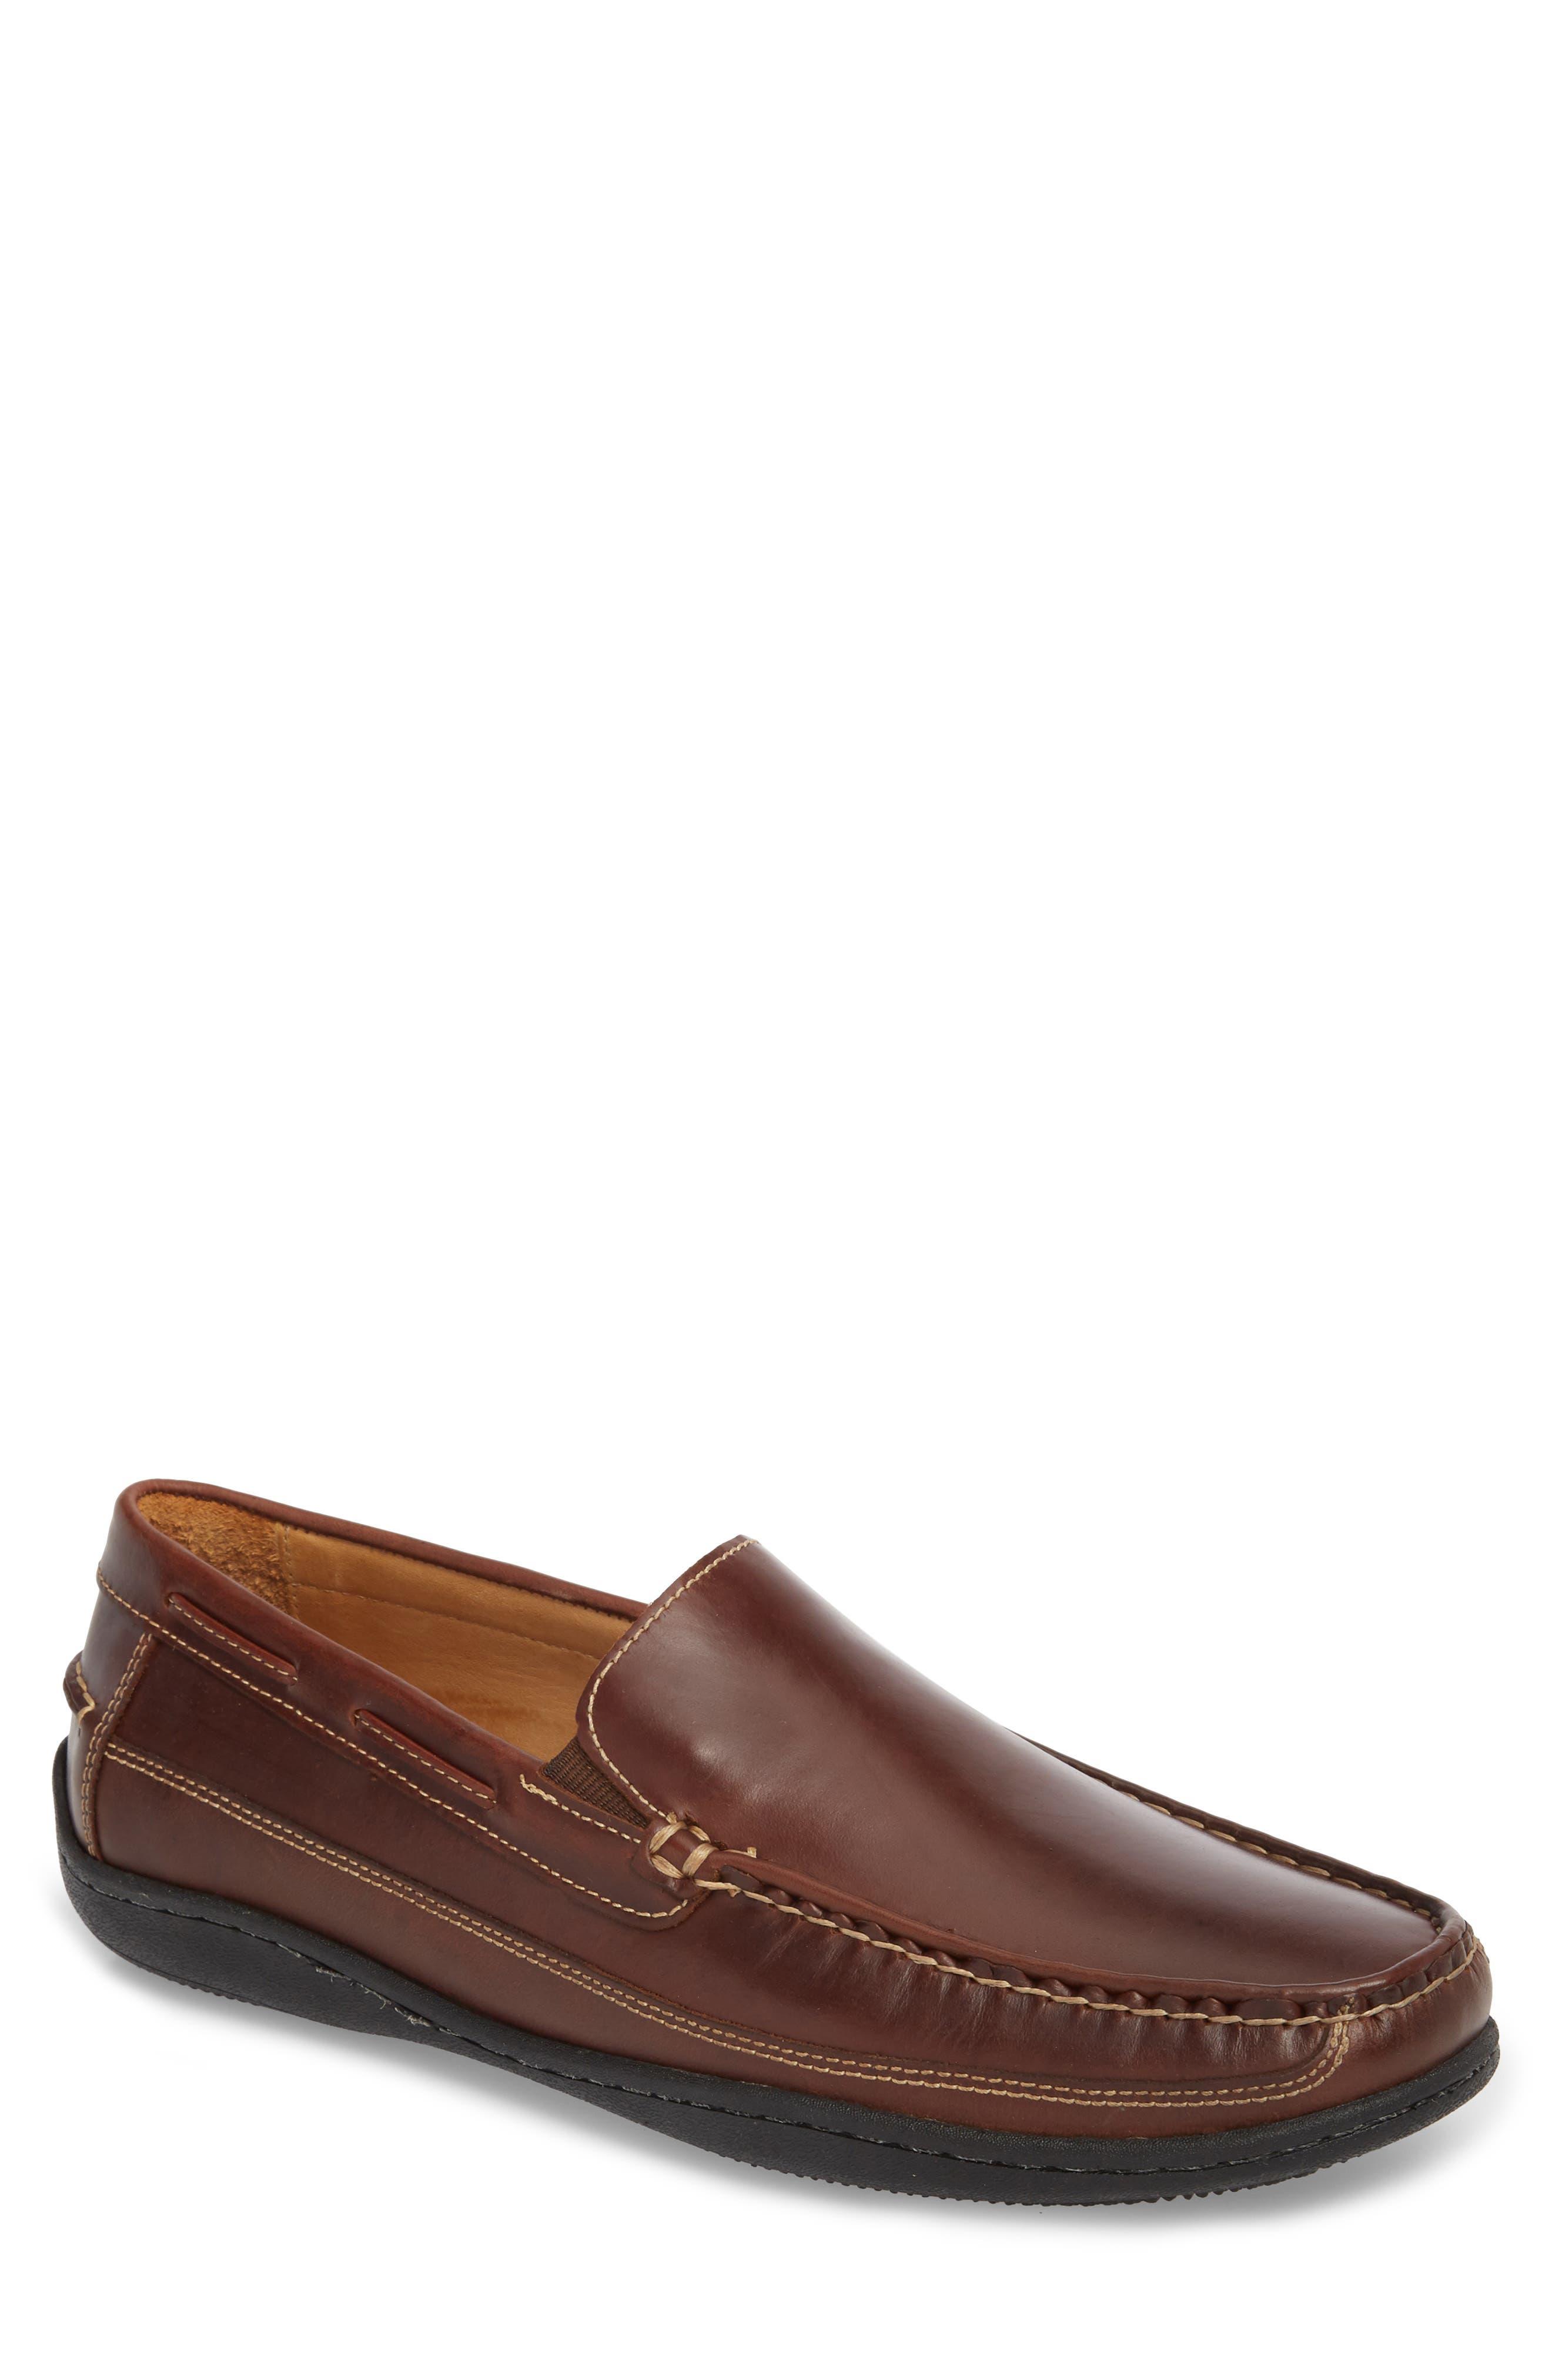 Fowler Moc Toe Loafer,                         Main,                         color, MAHOGANY LEATHER